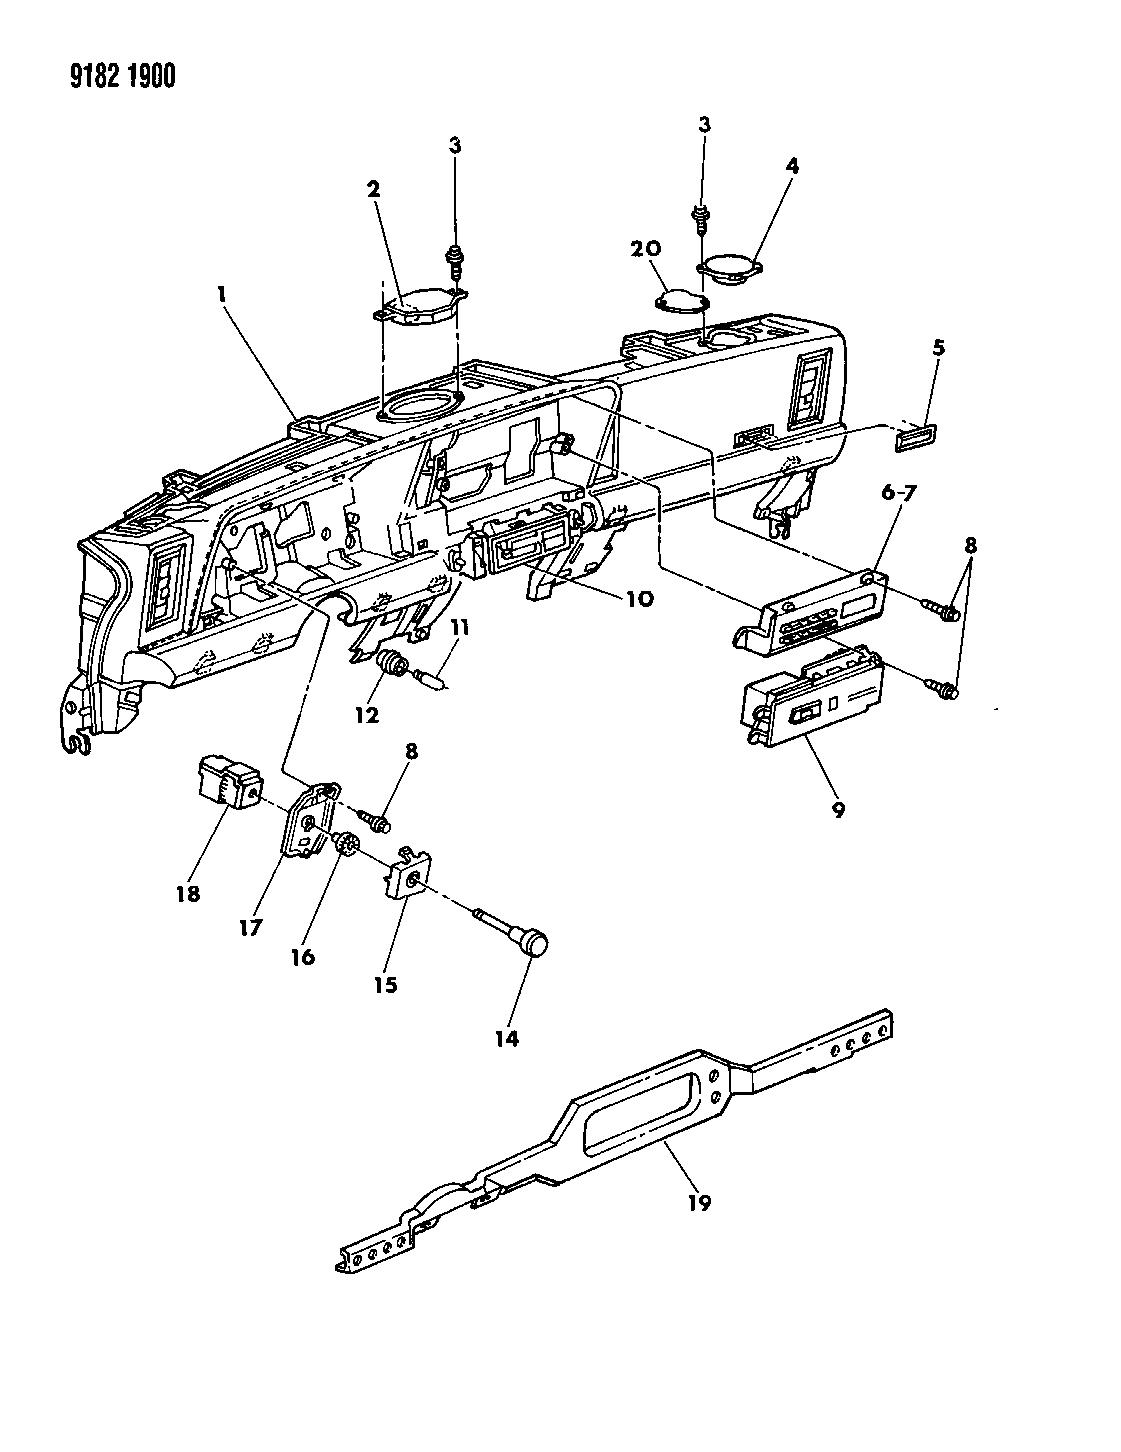 1989 chrysler lebaron gtc instrument panel panel, speakers 110 volt fuse box catalogue of schemas